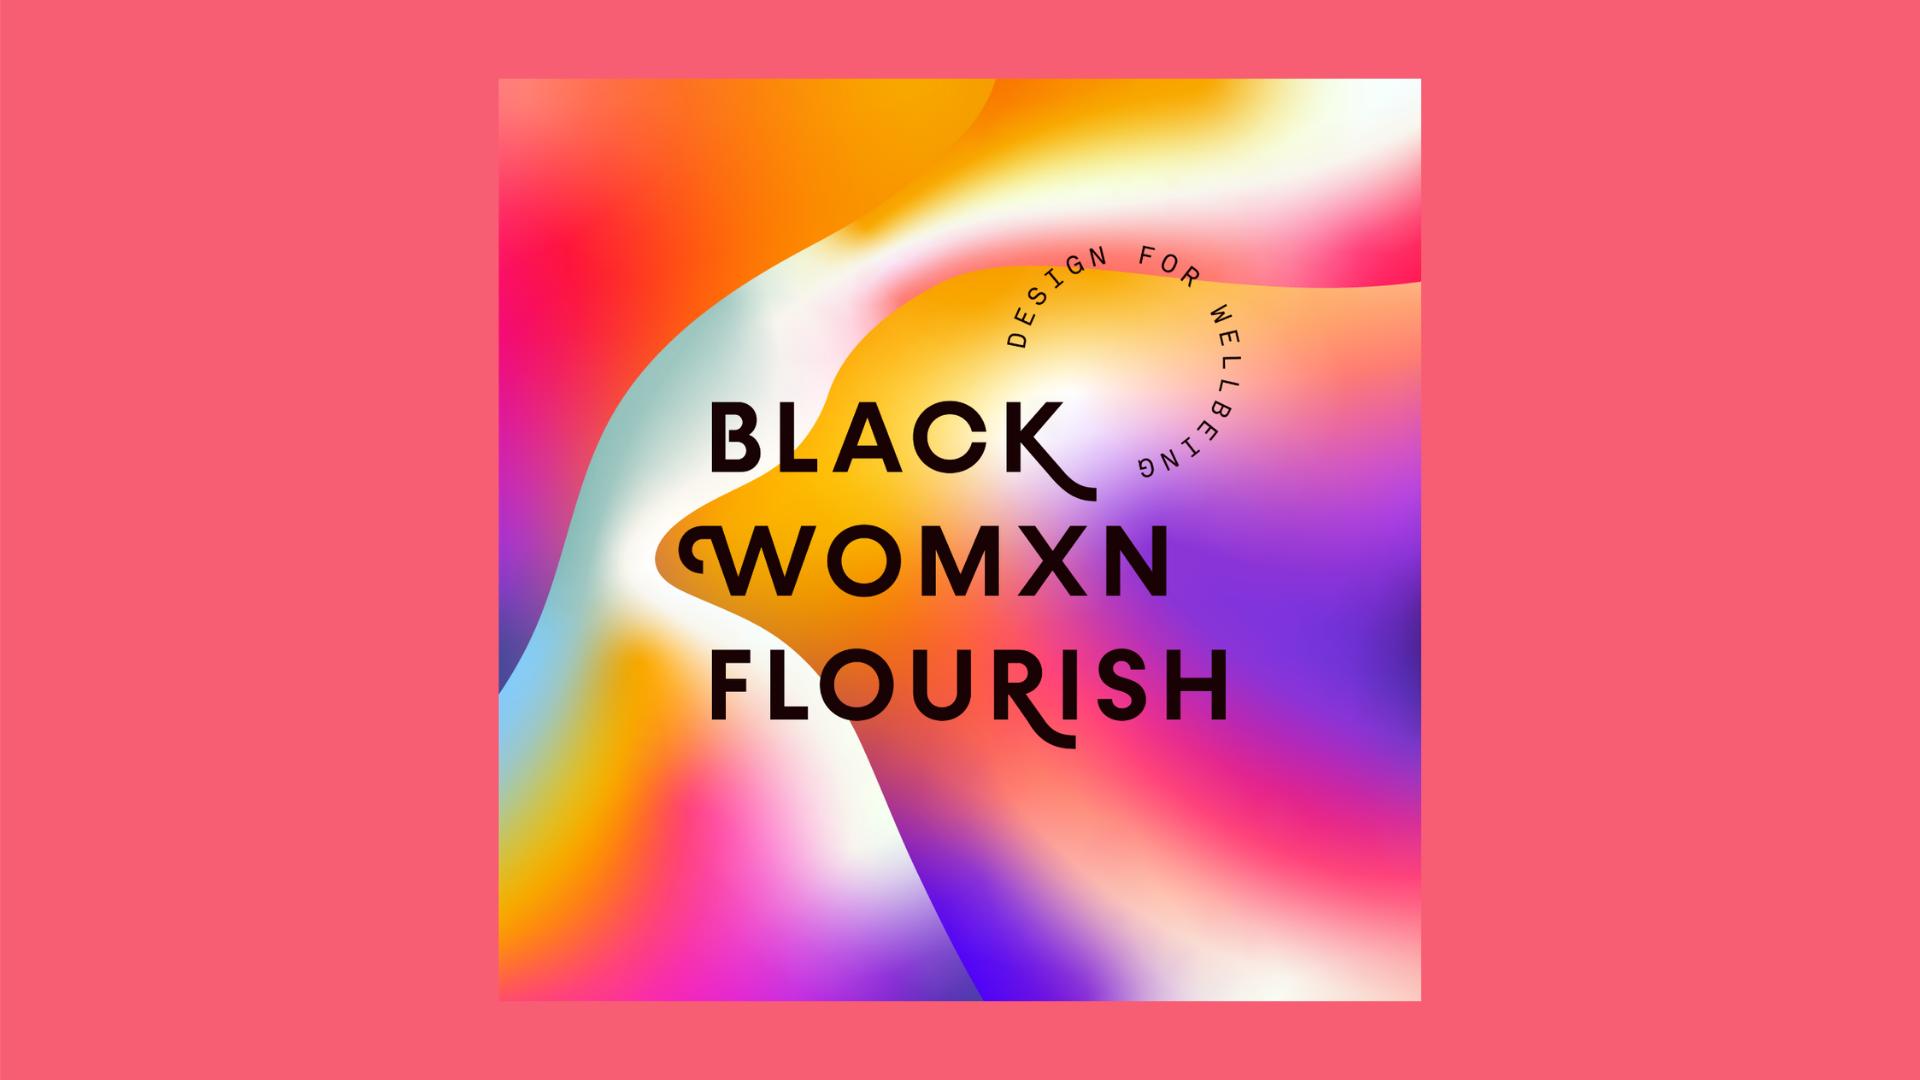 Black Womxn Flourish: Centering Black Women's Well-being by Design